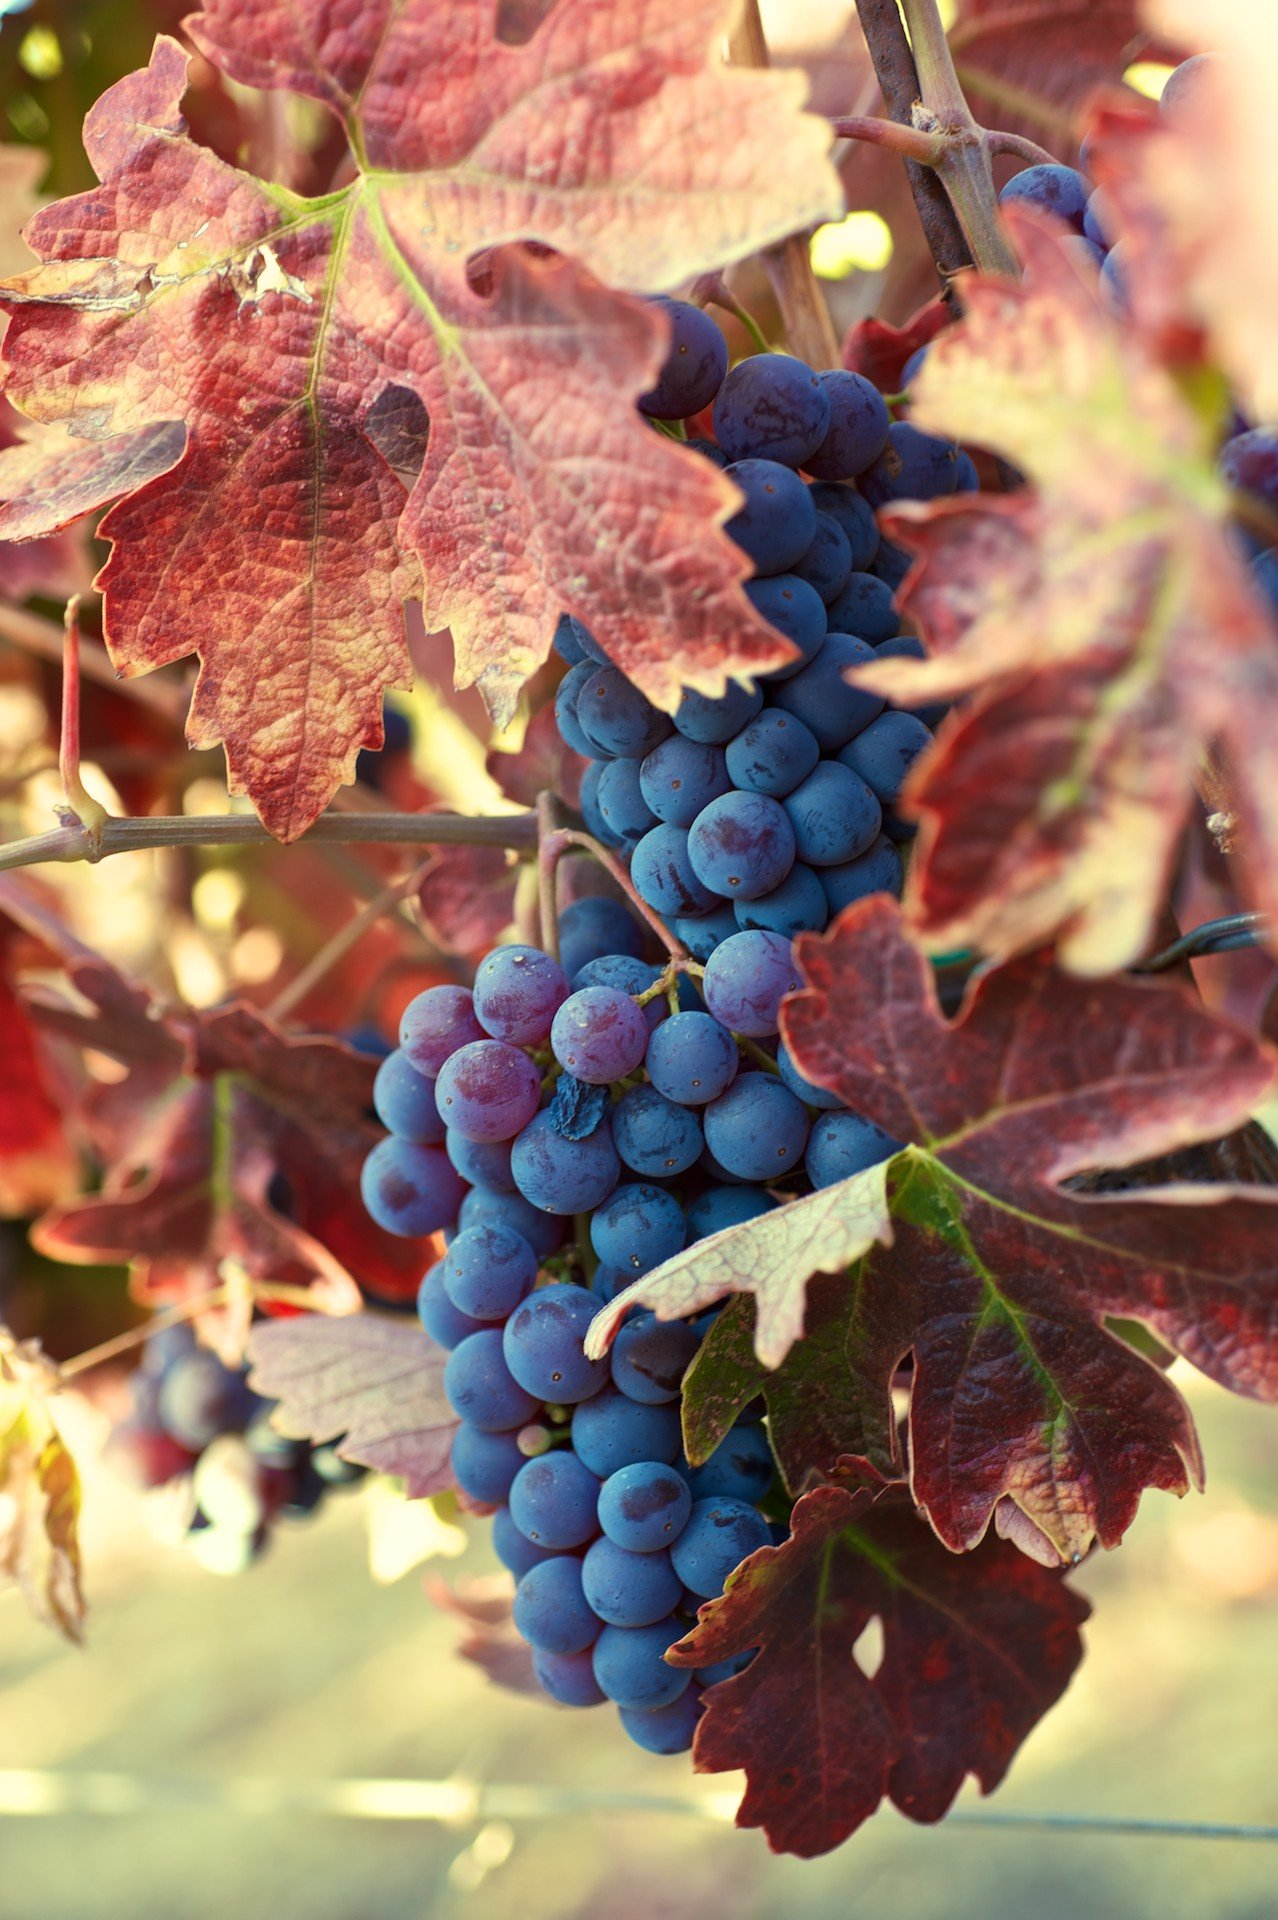 Cinsault Grapes on the Vine